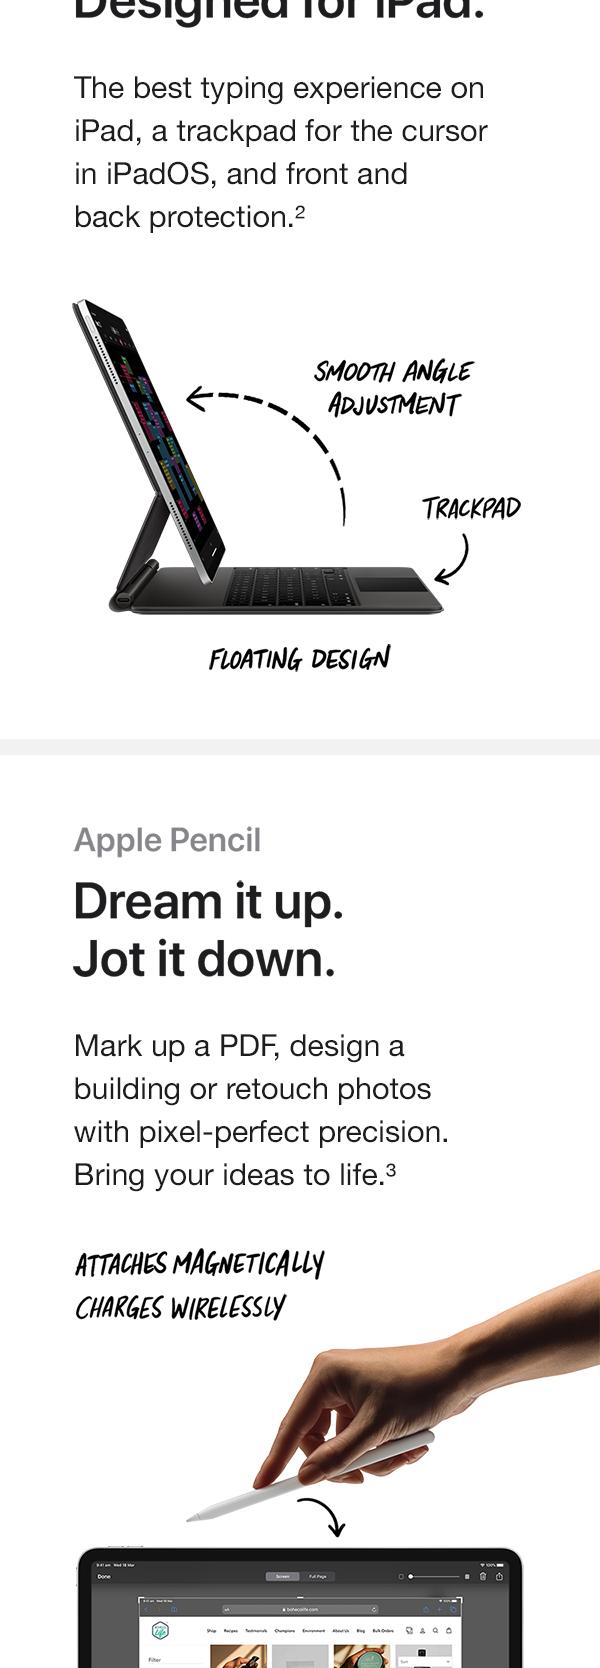 iPad image 4